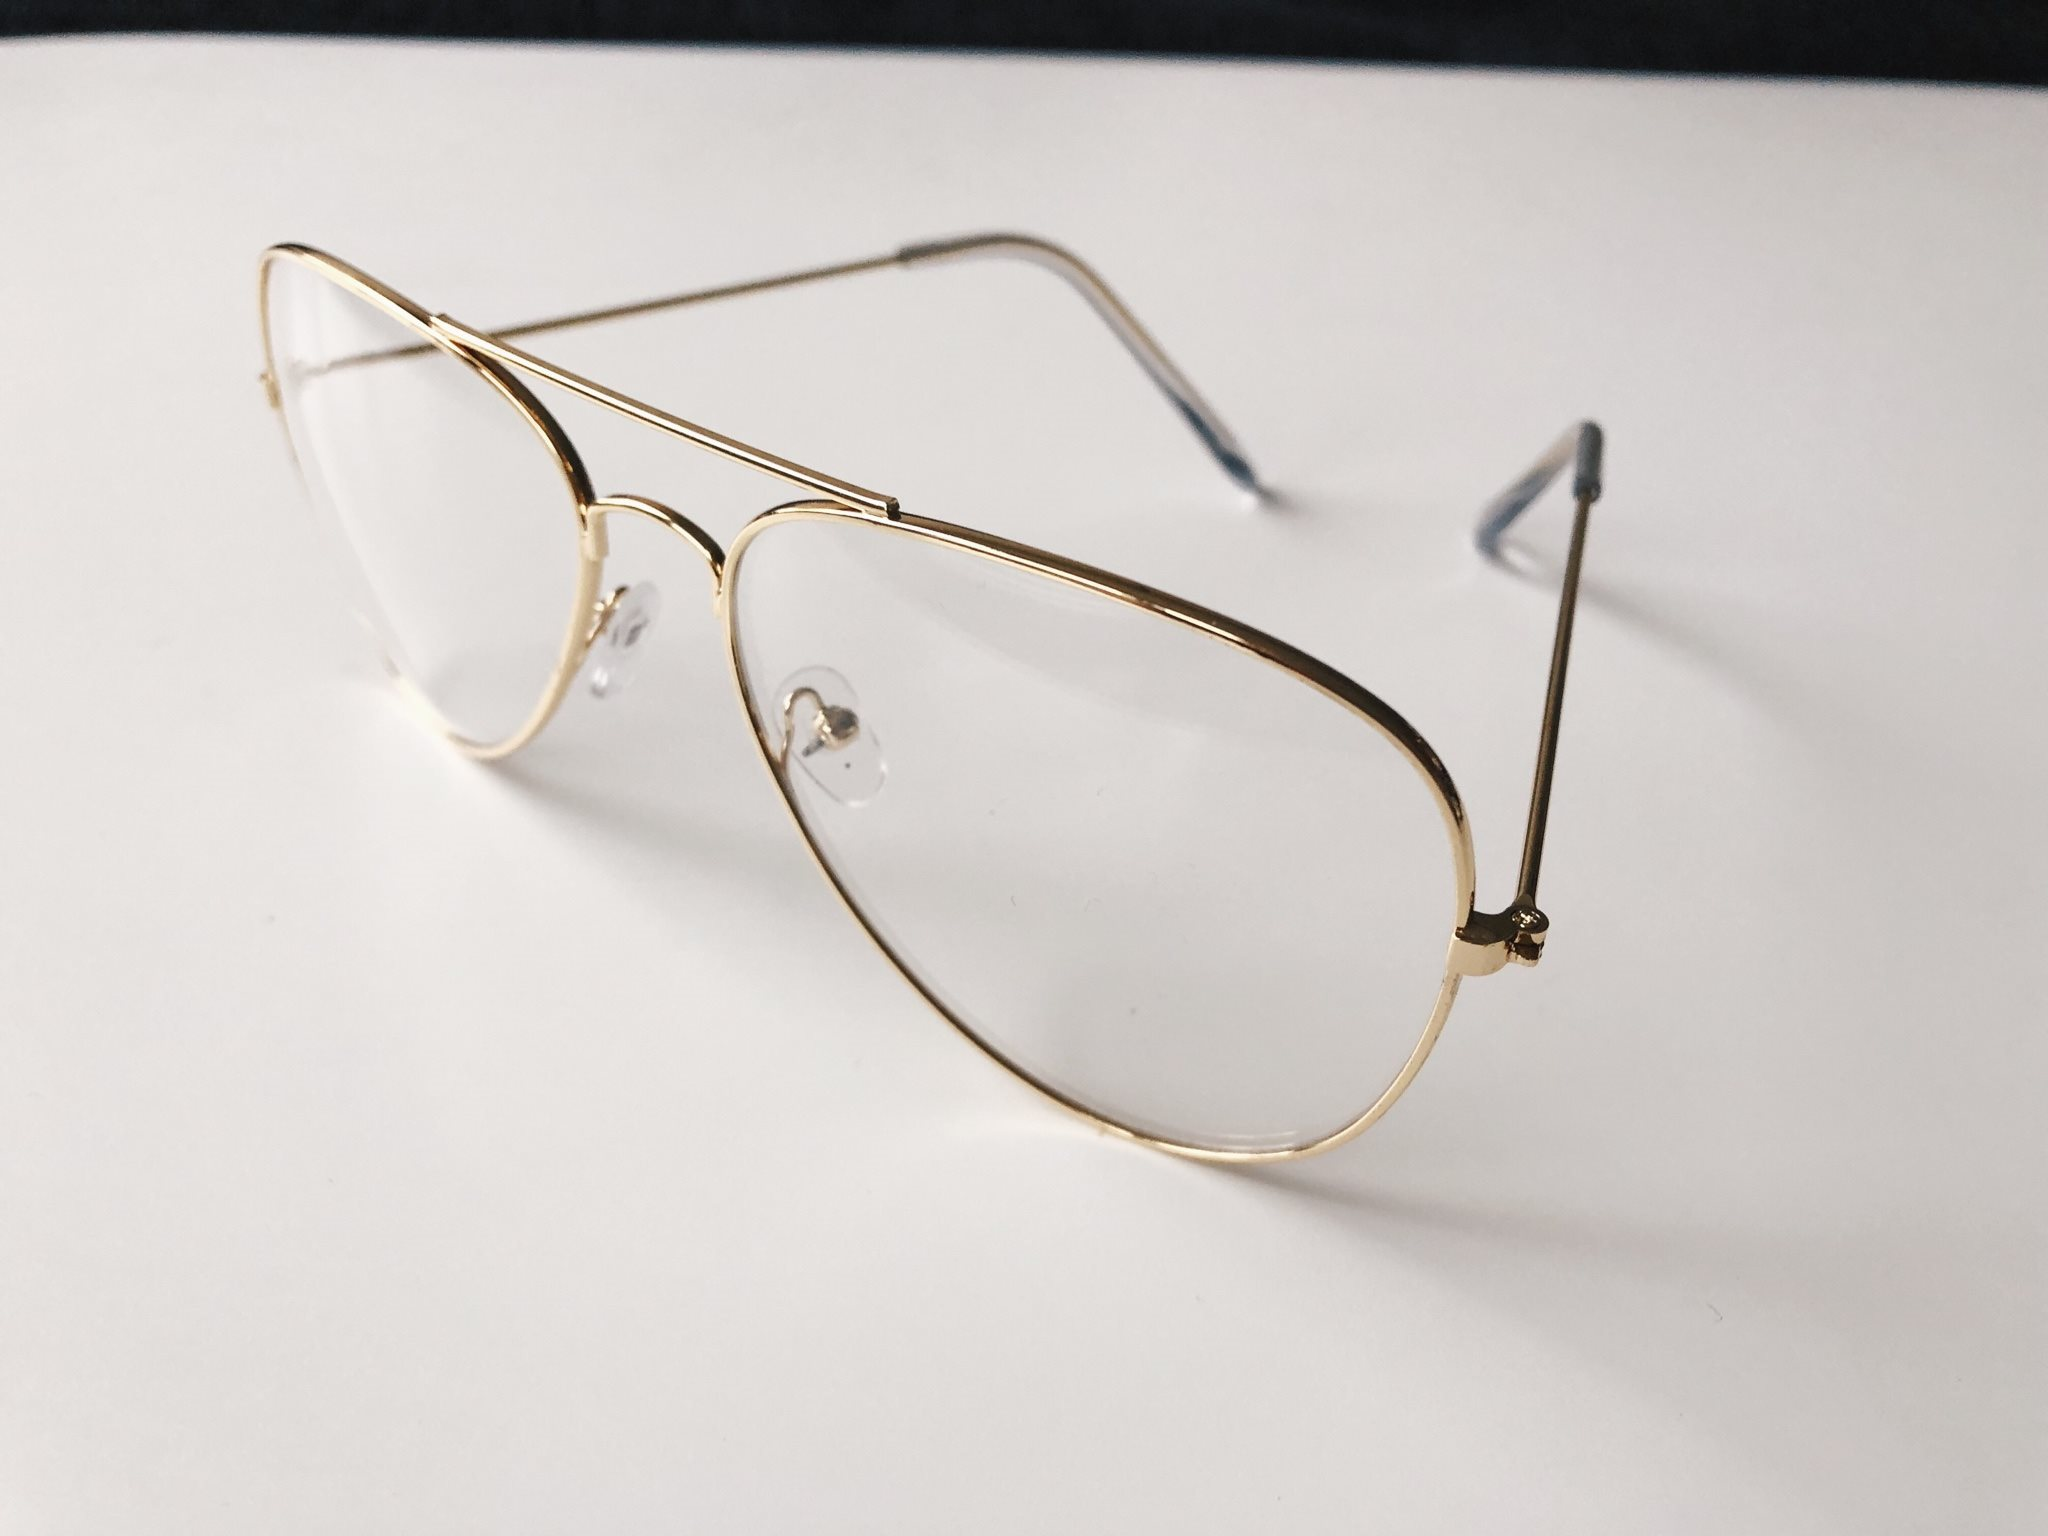 Glasögon klart glas utan styrka guld aviator pi.. (330385536) ᐈ Köp ... 58a22bb2cc8e7